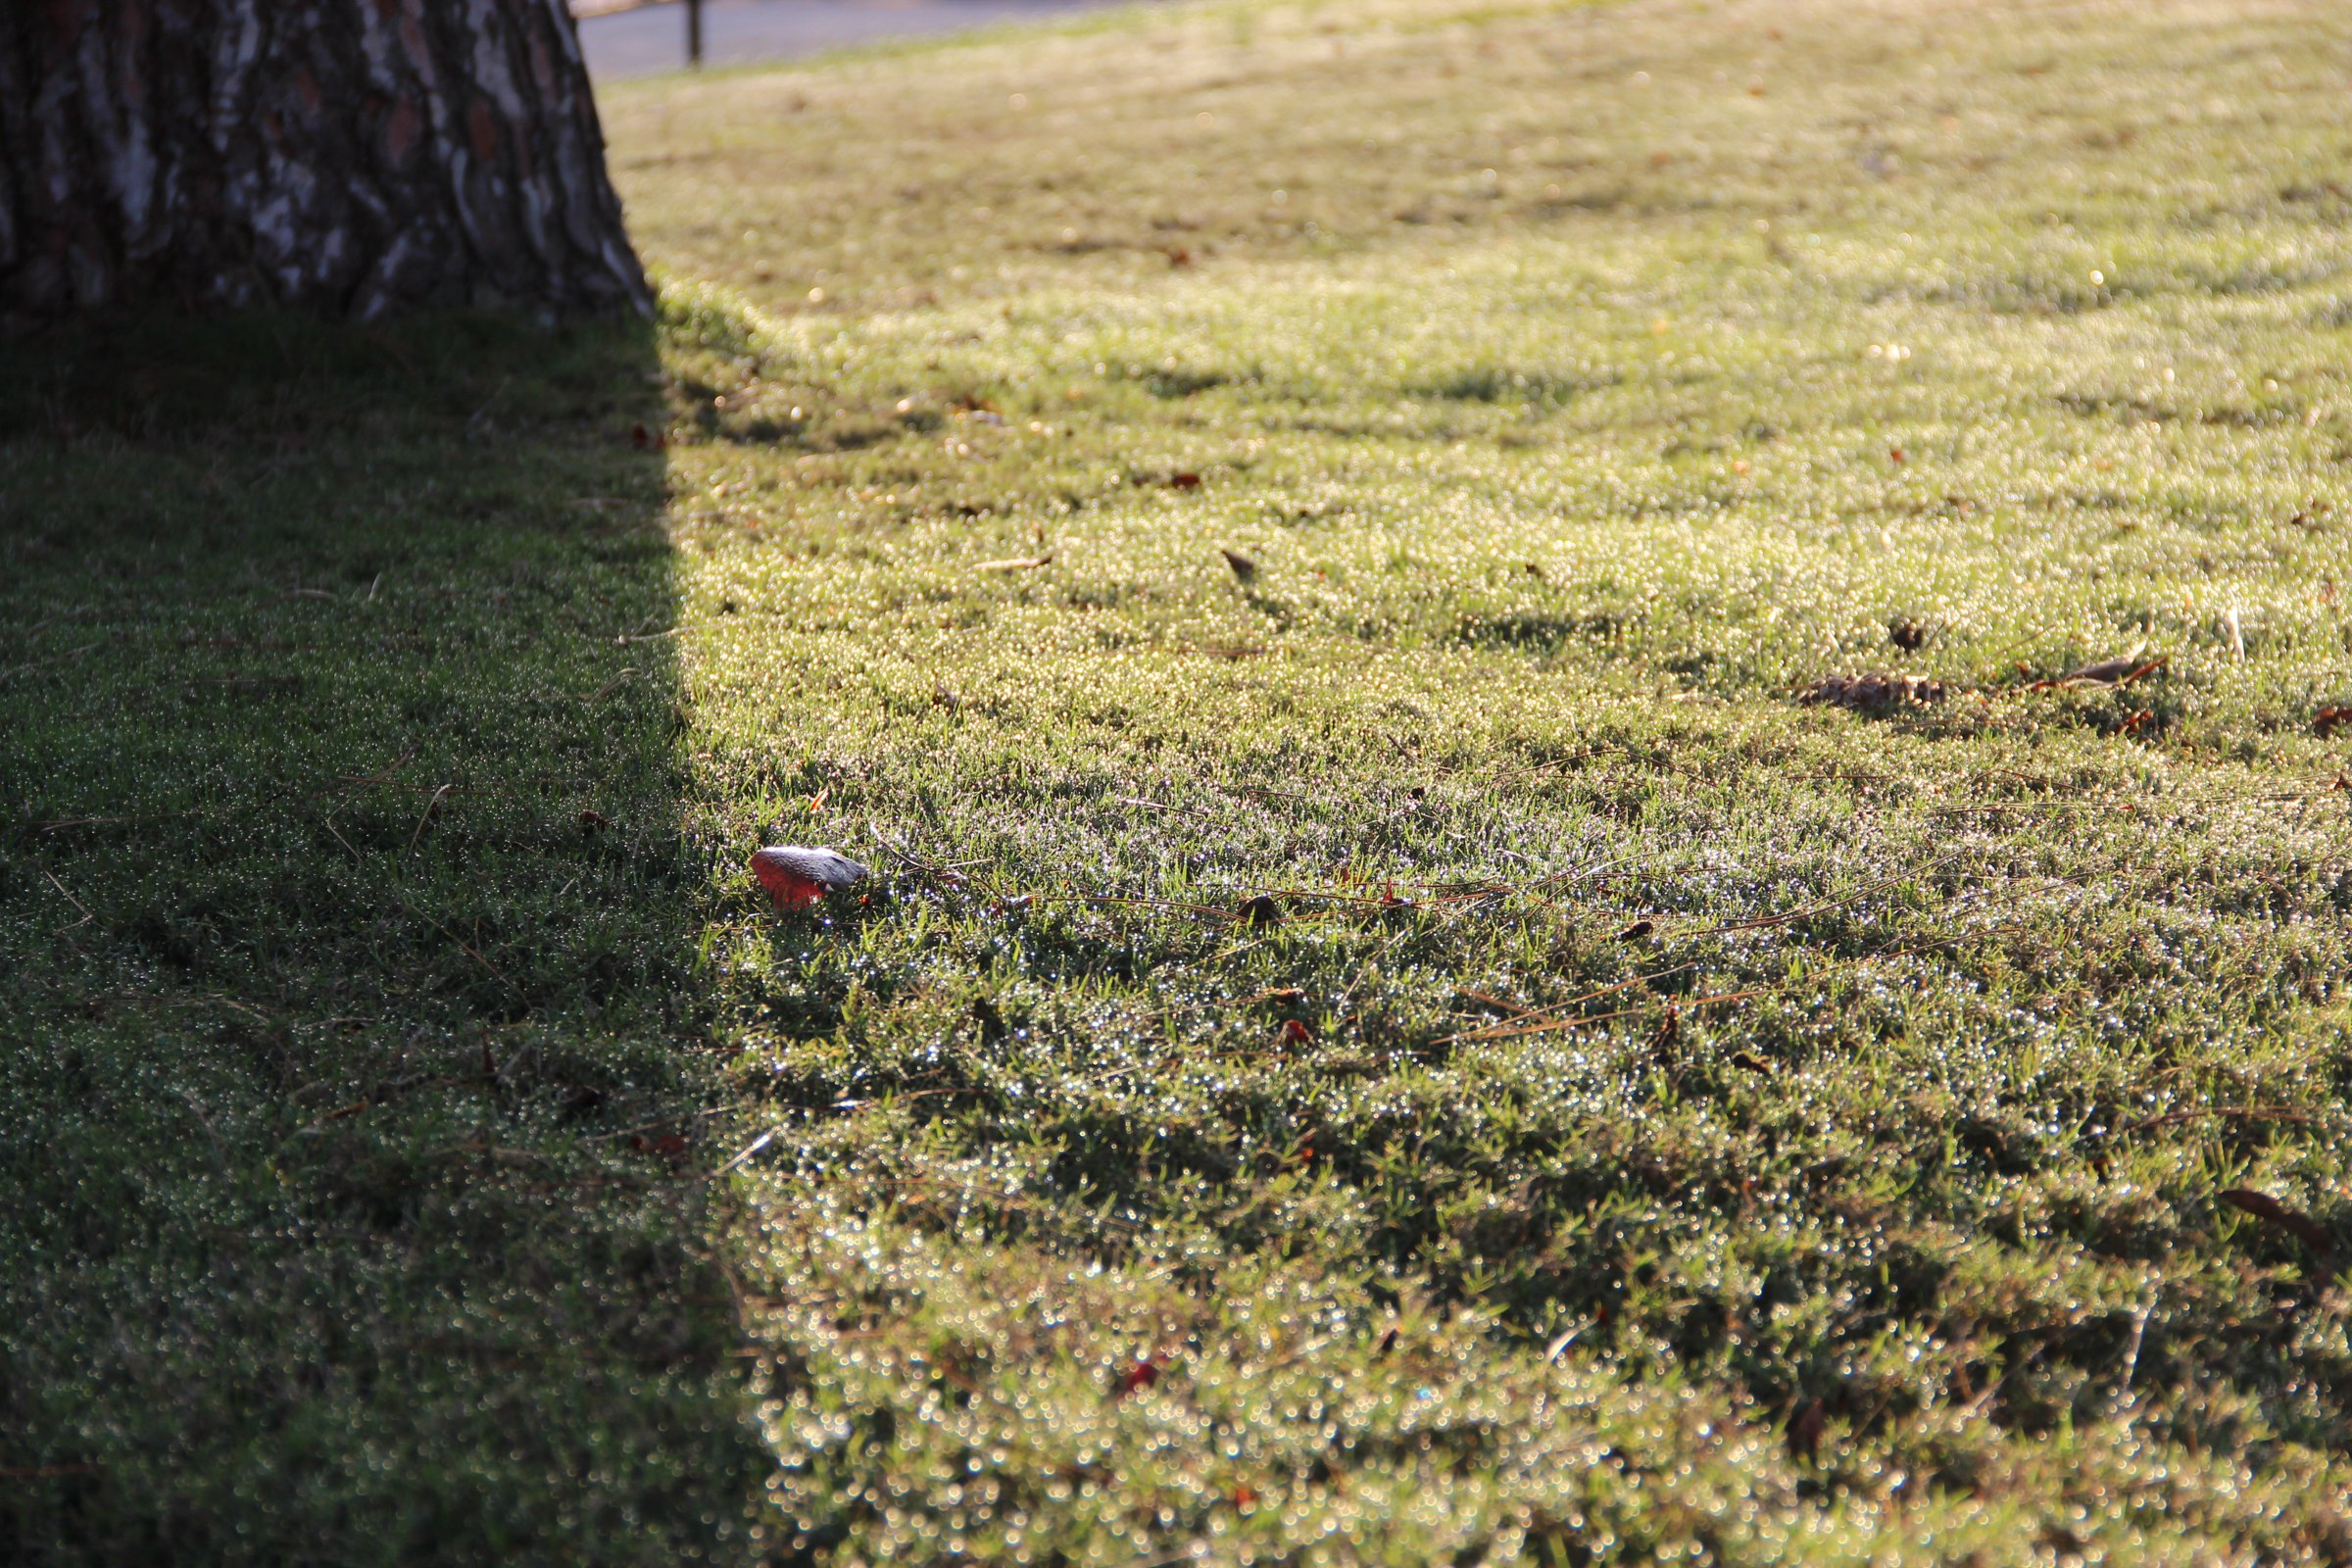 Grass in Sunlight & Shadow